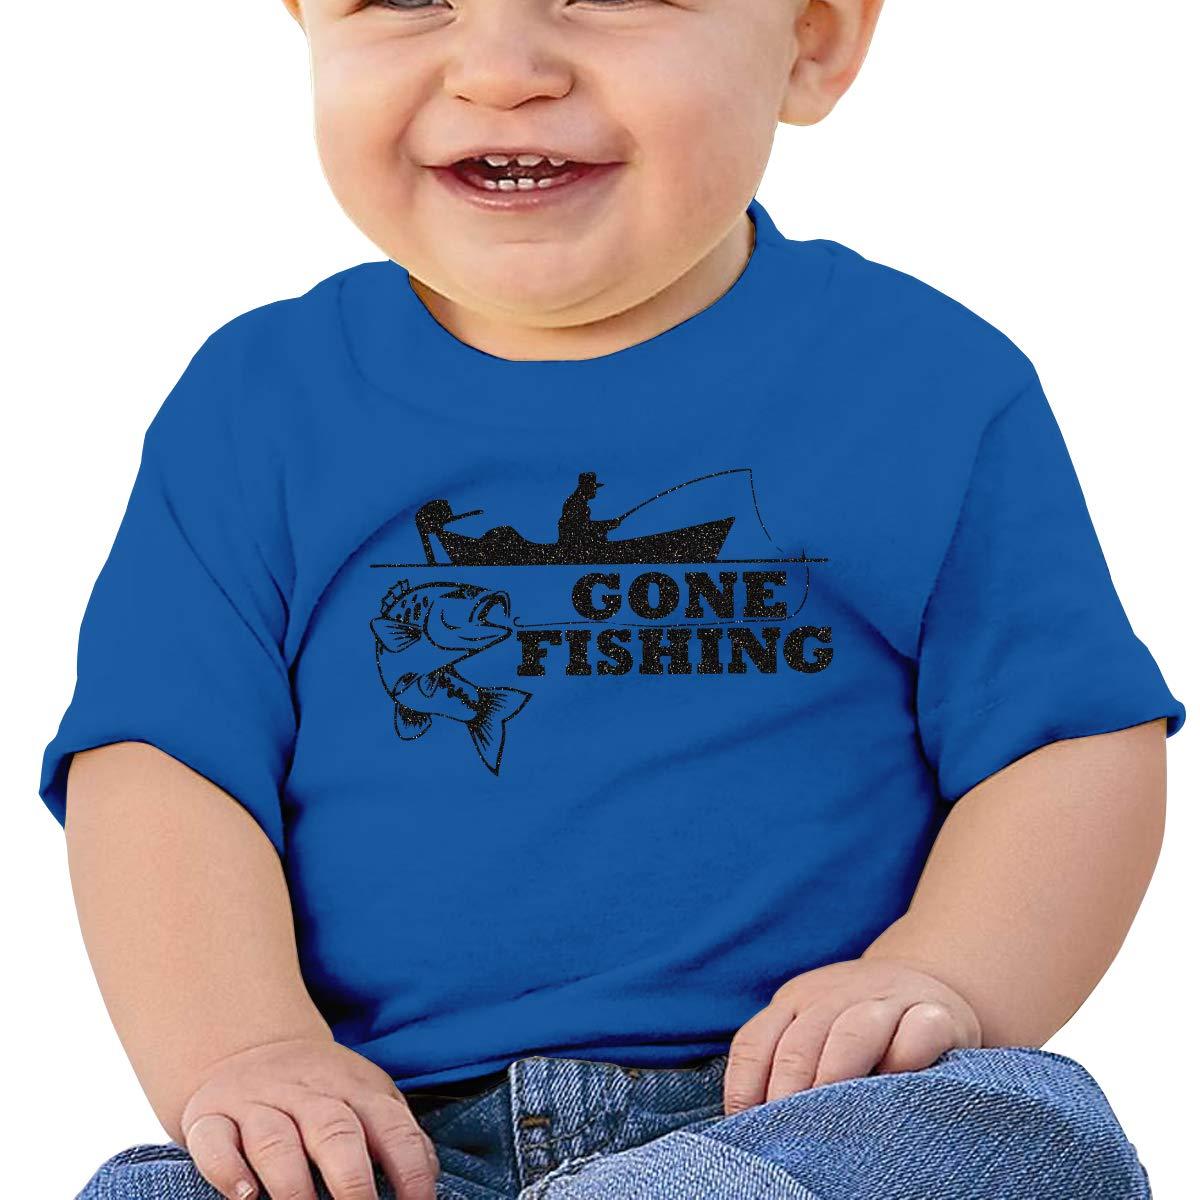 XHX403 Gone Fishing Infant Kids T Shirt Cotton Tee Toddler Baby 6-18M